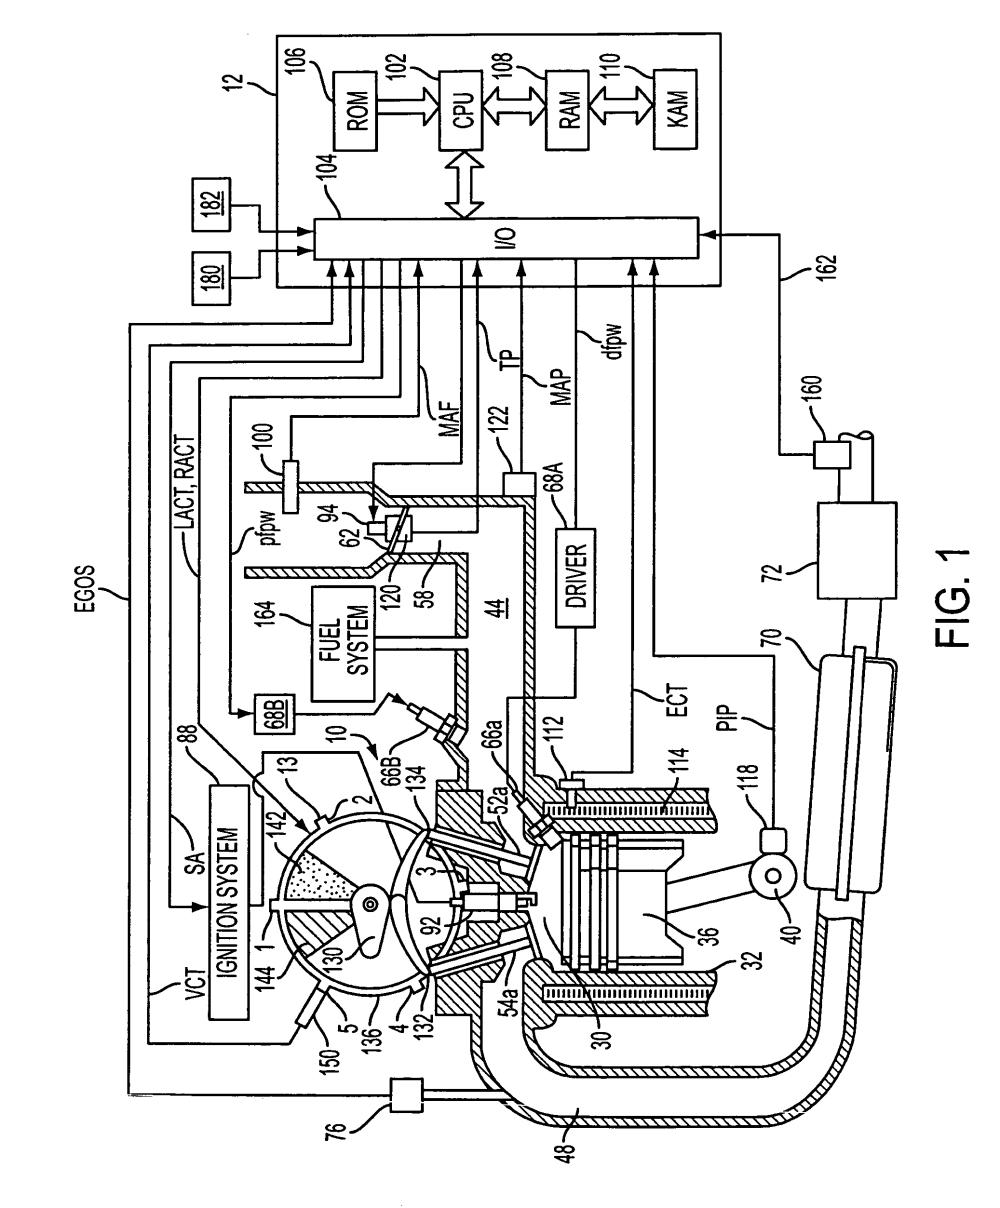 medium resolution of paccar mx wiring diagram page 5 wiring diagram and schematics rh rivcas org